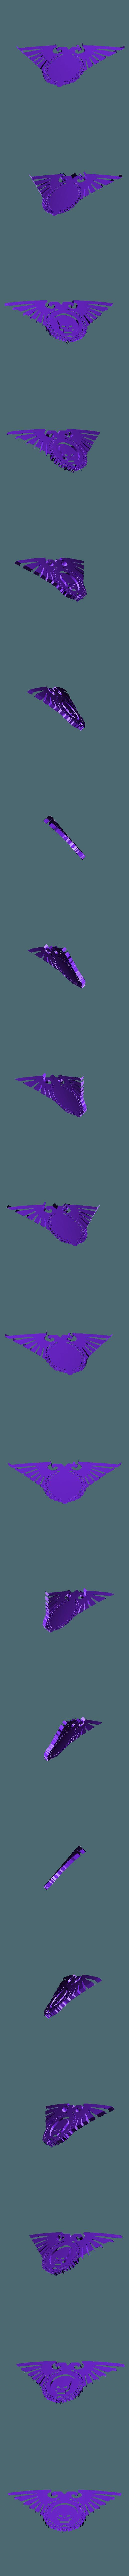 ROGUE_TRADER_V1.stl Download free STL file Logo Pack - Carapace • Design to 3D print, yaemhay